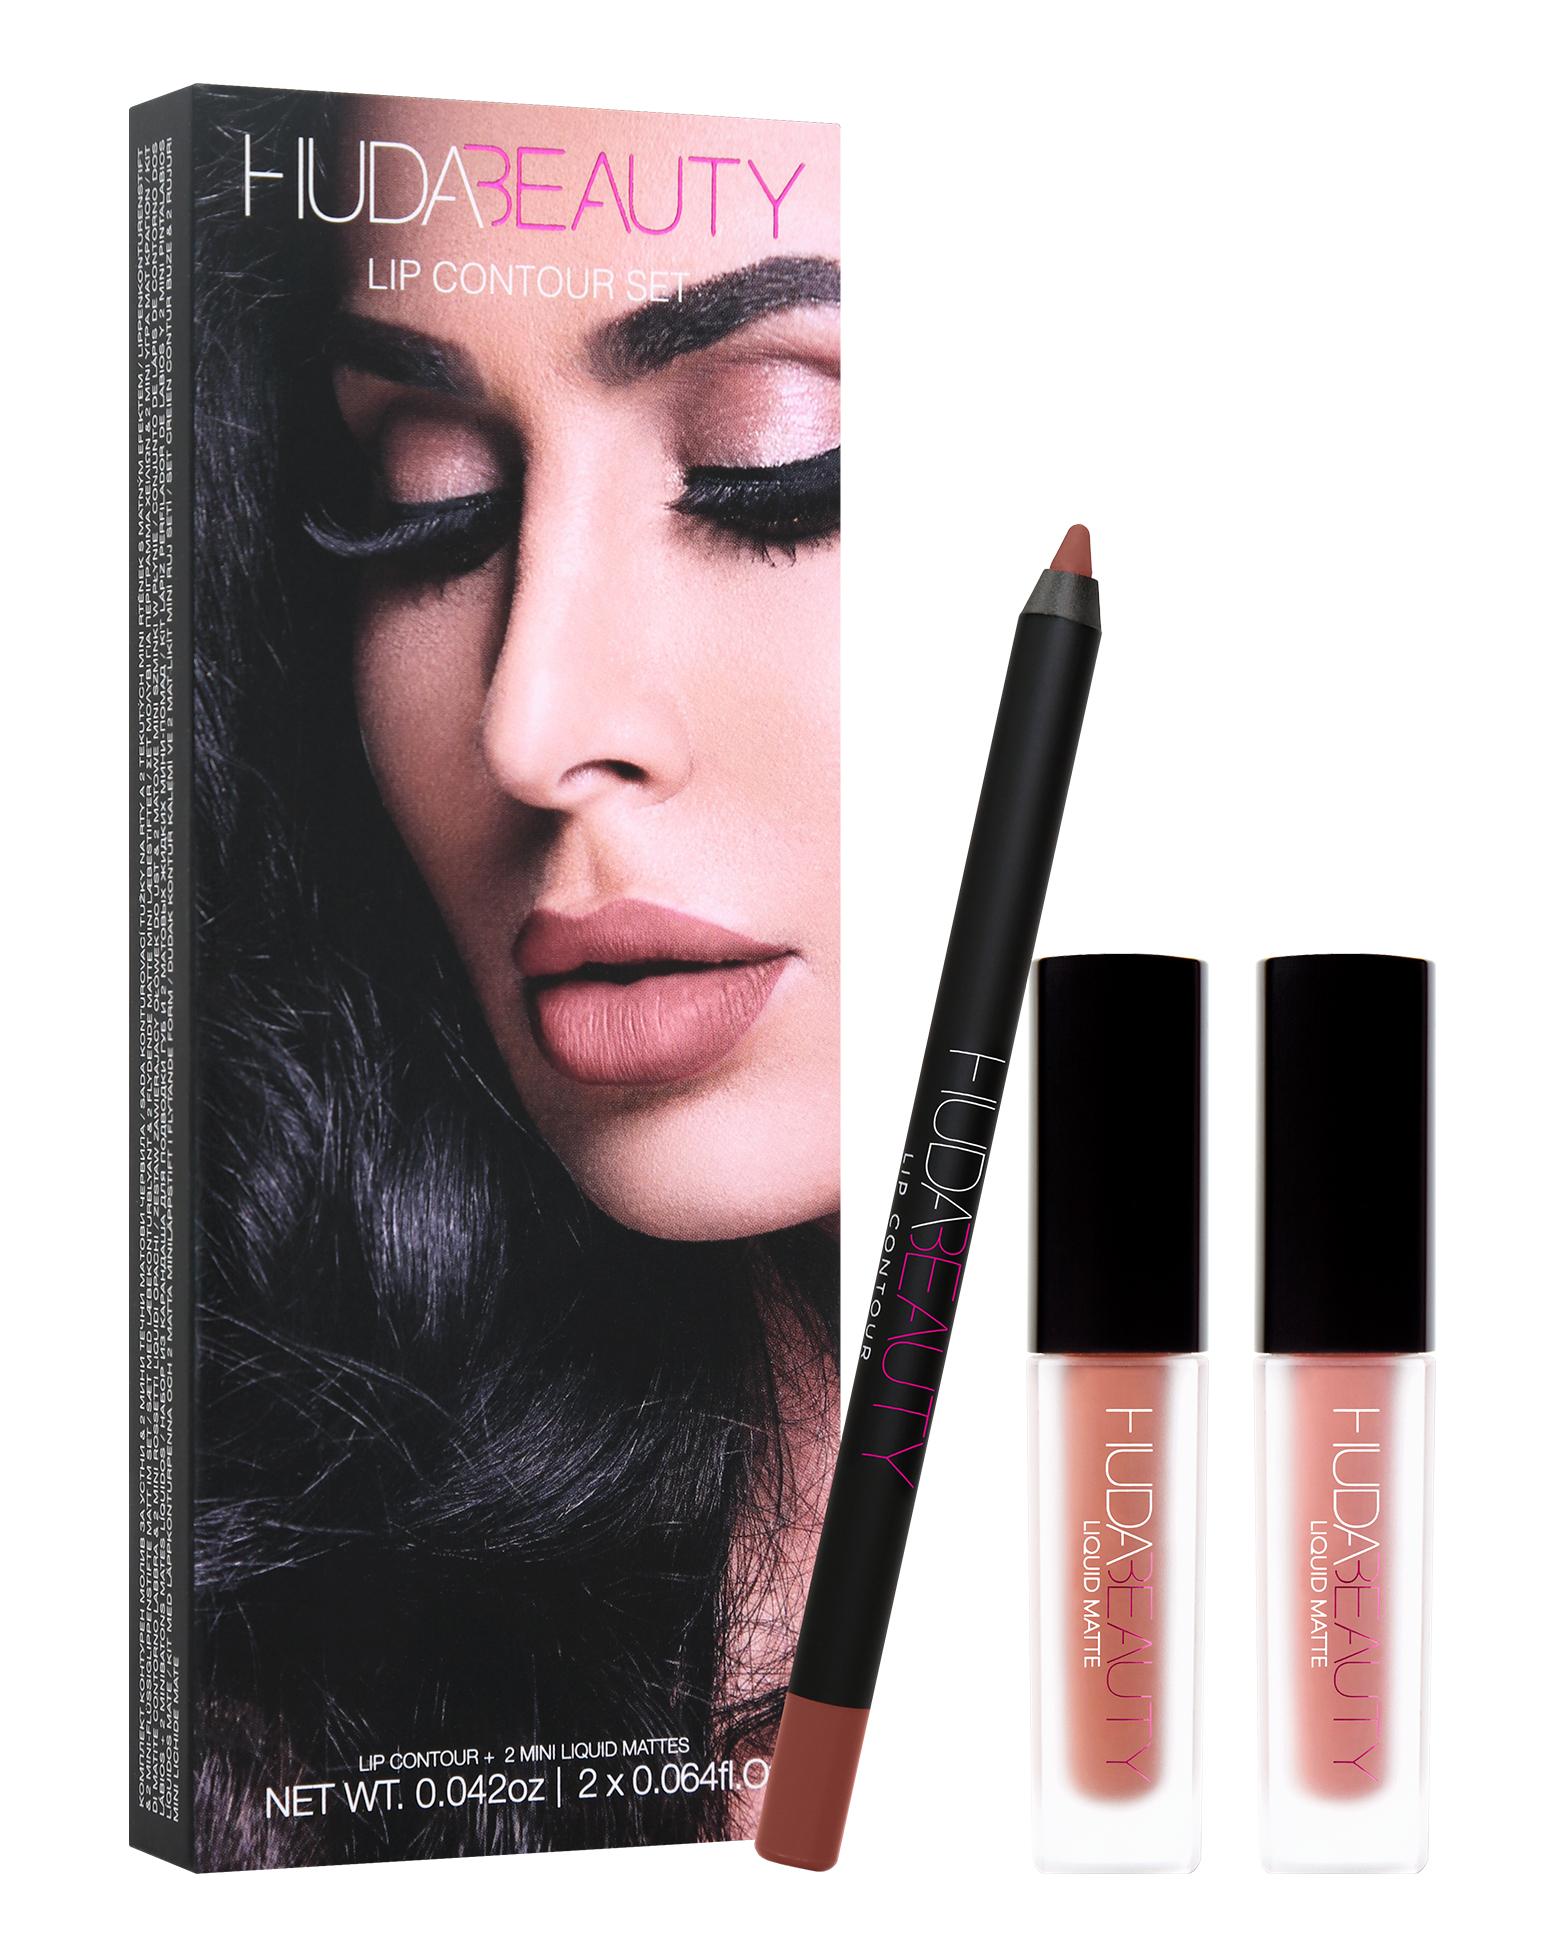 huda beauty lip contour